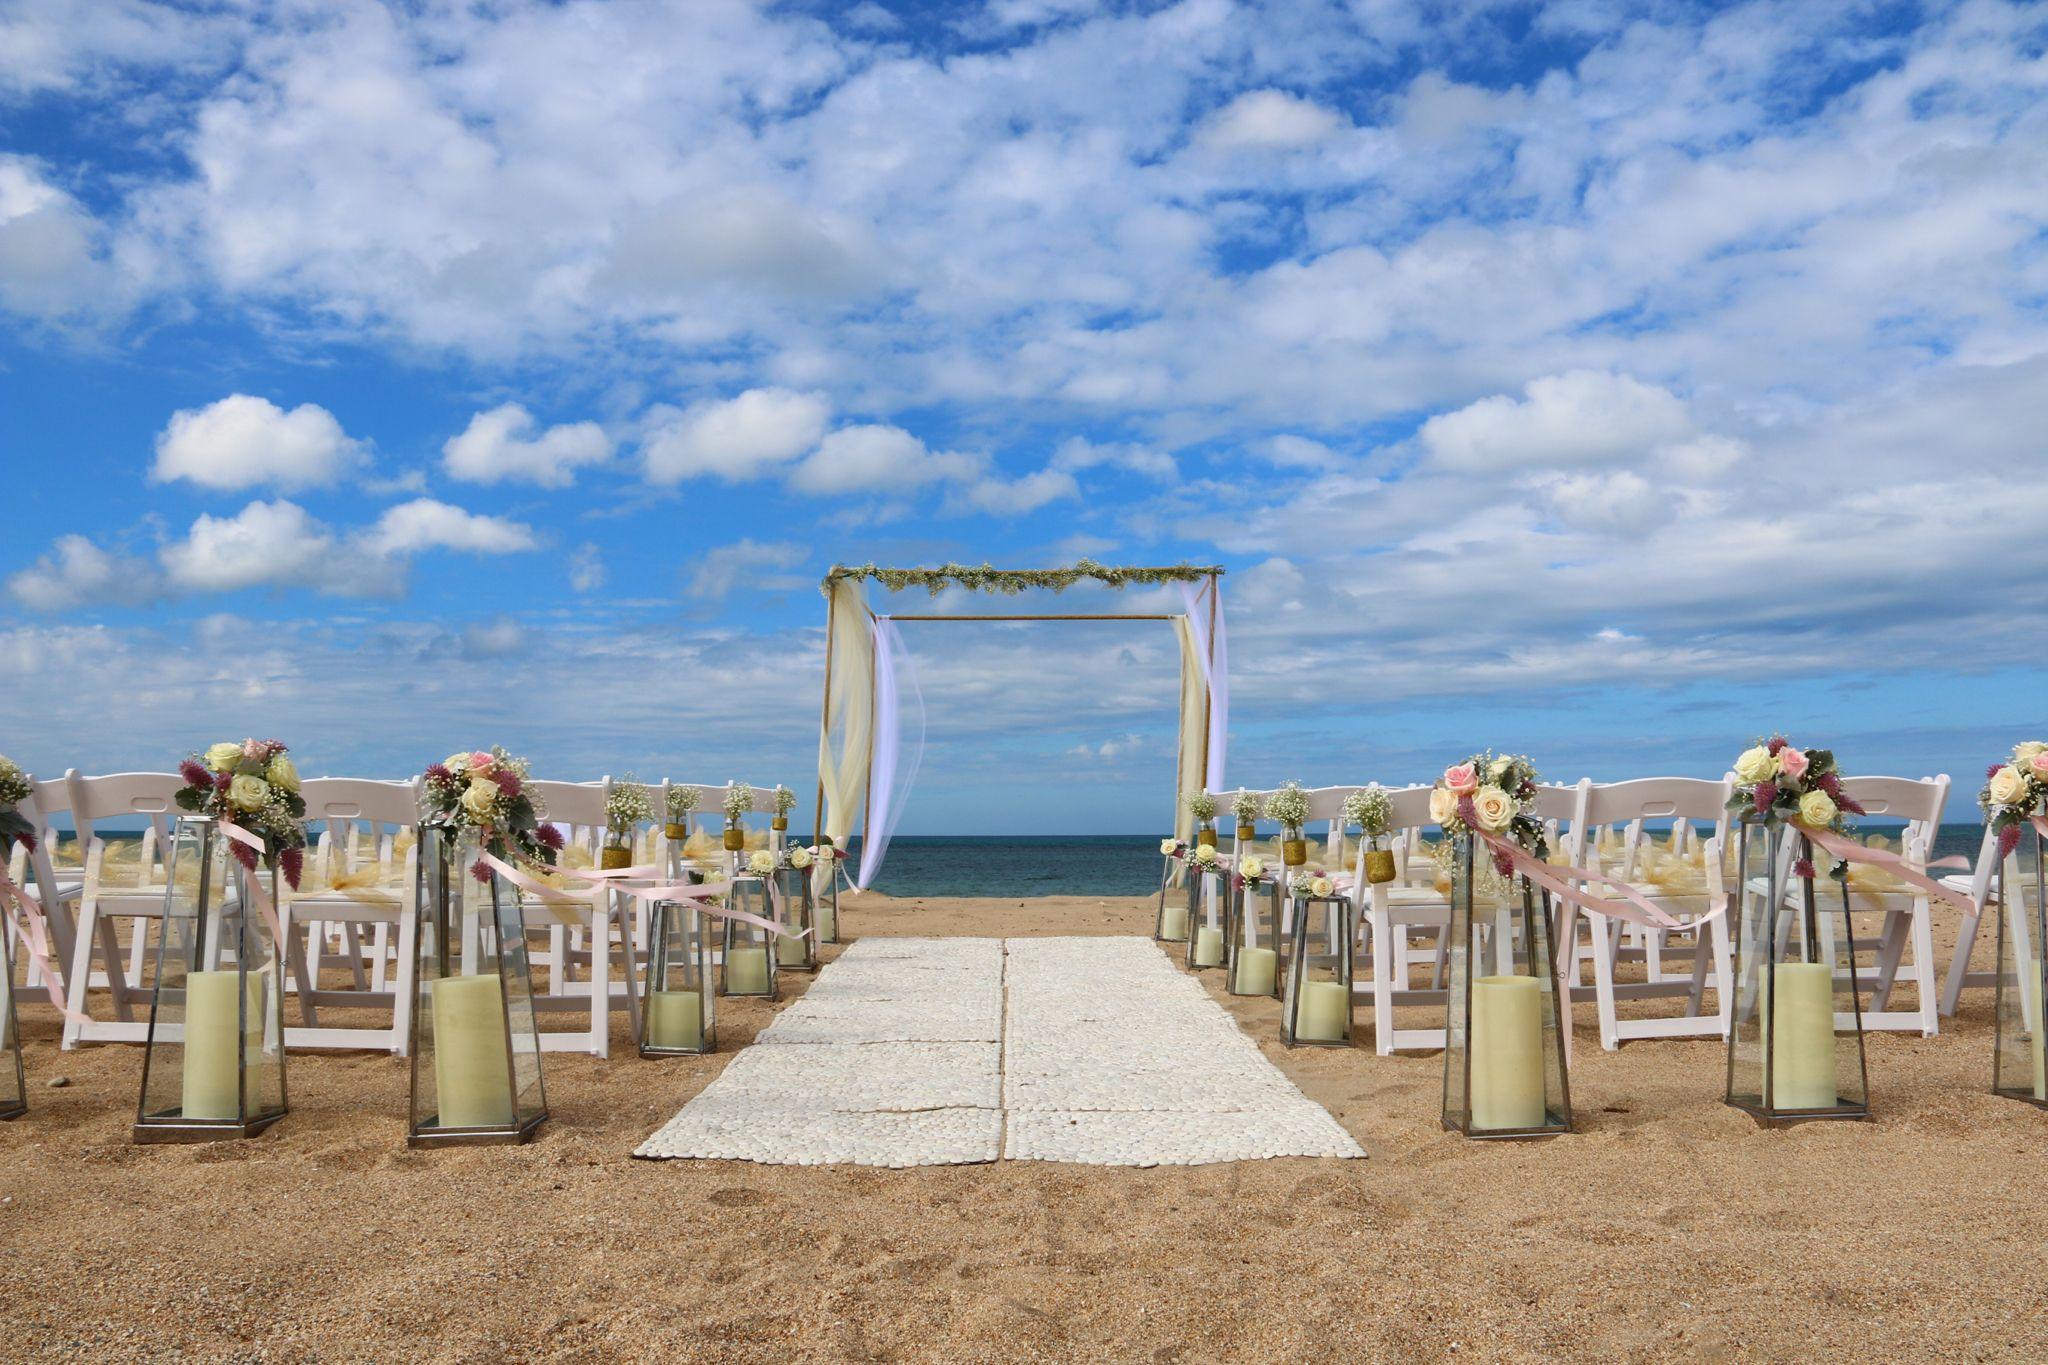 Sunrise beach wedding  Sunrise Beach Novotel Ningaloo Resort Weddings  Novotel Ningaloo